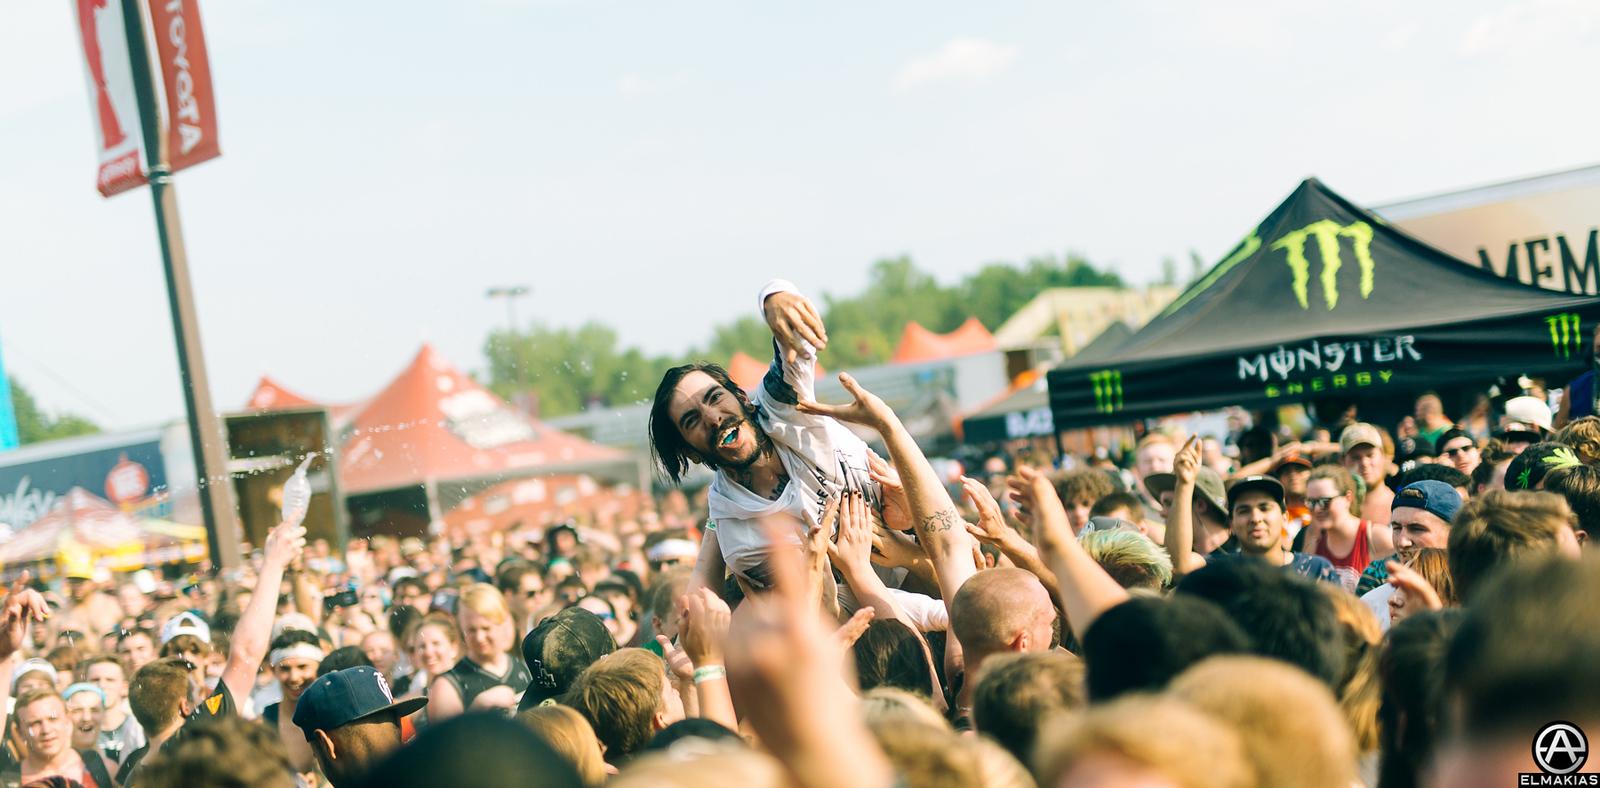 Carlos Navarro crowdsurfing during Beartooth live at Vans Warped Tour 2015 by Adam Elmakias